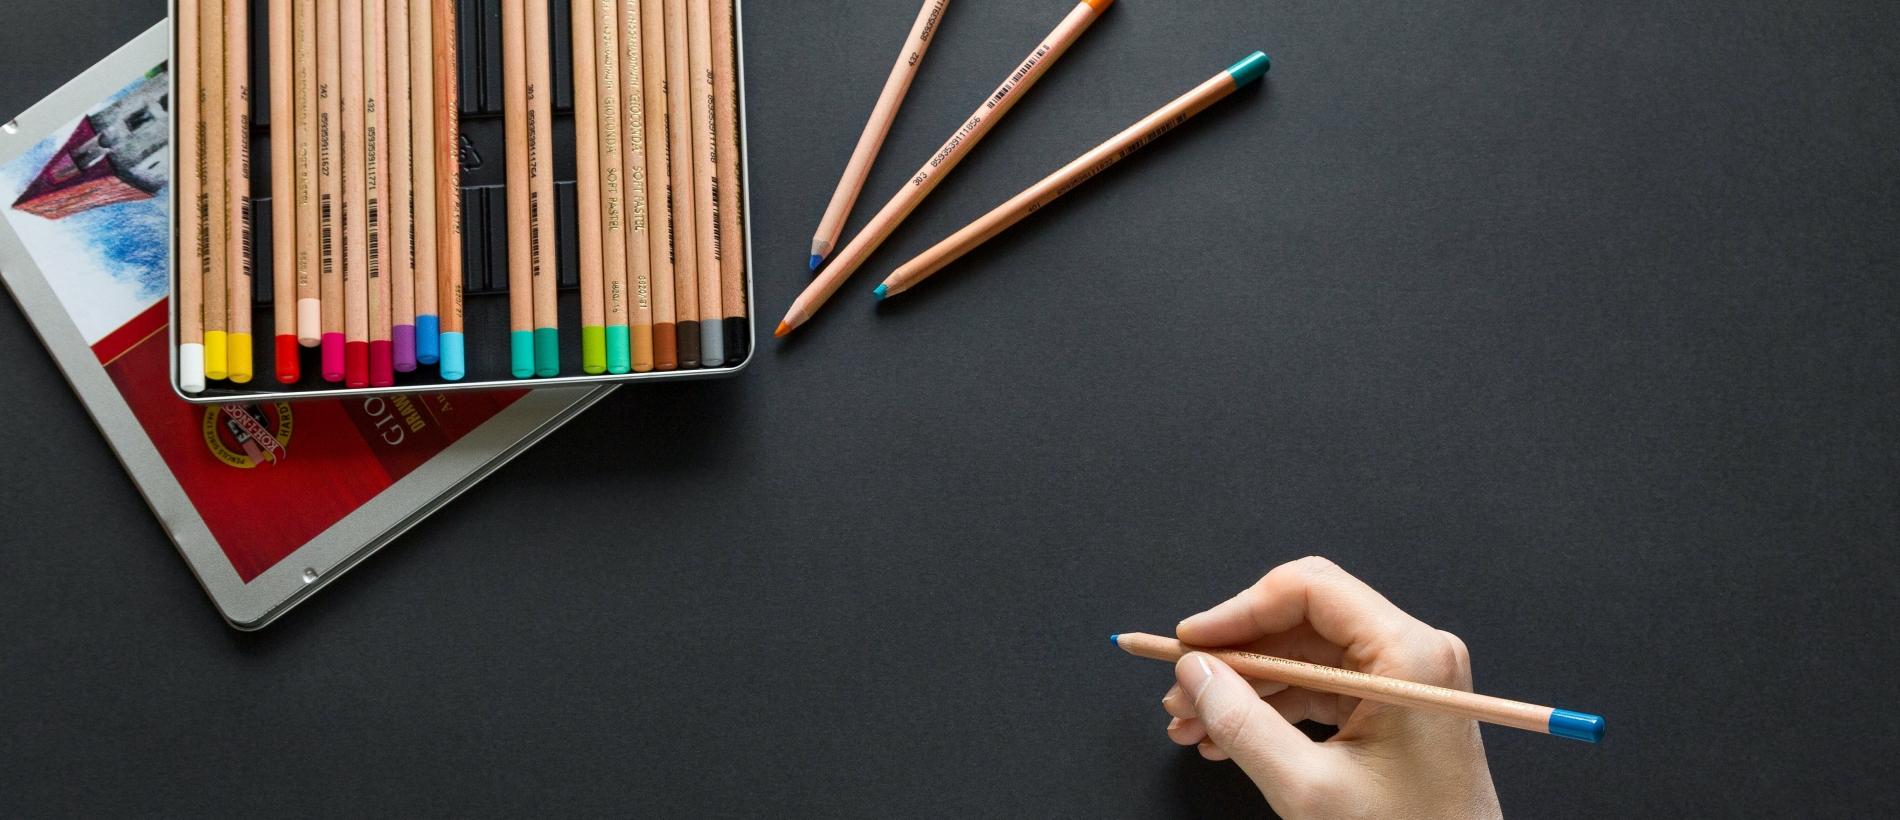 Person holding colored pencil